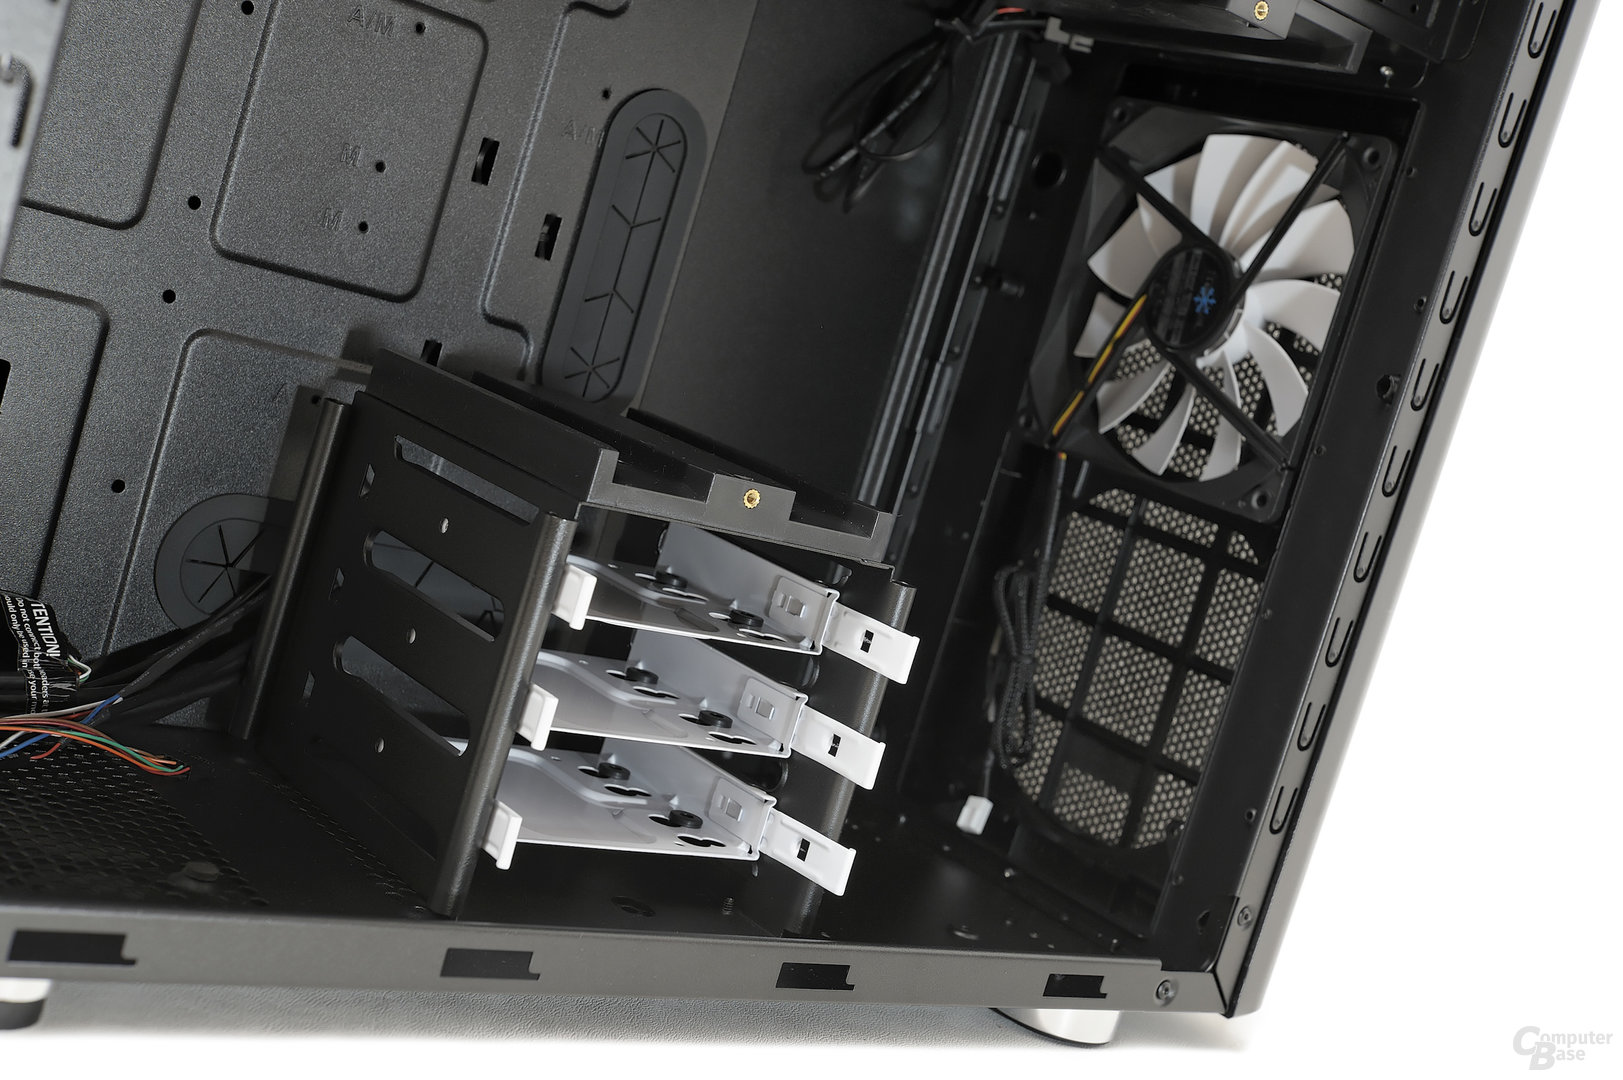 Fractal Design Arc Midi R2 - Variabler unterer Festplattenkäfig